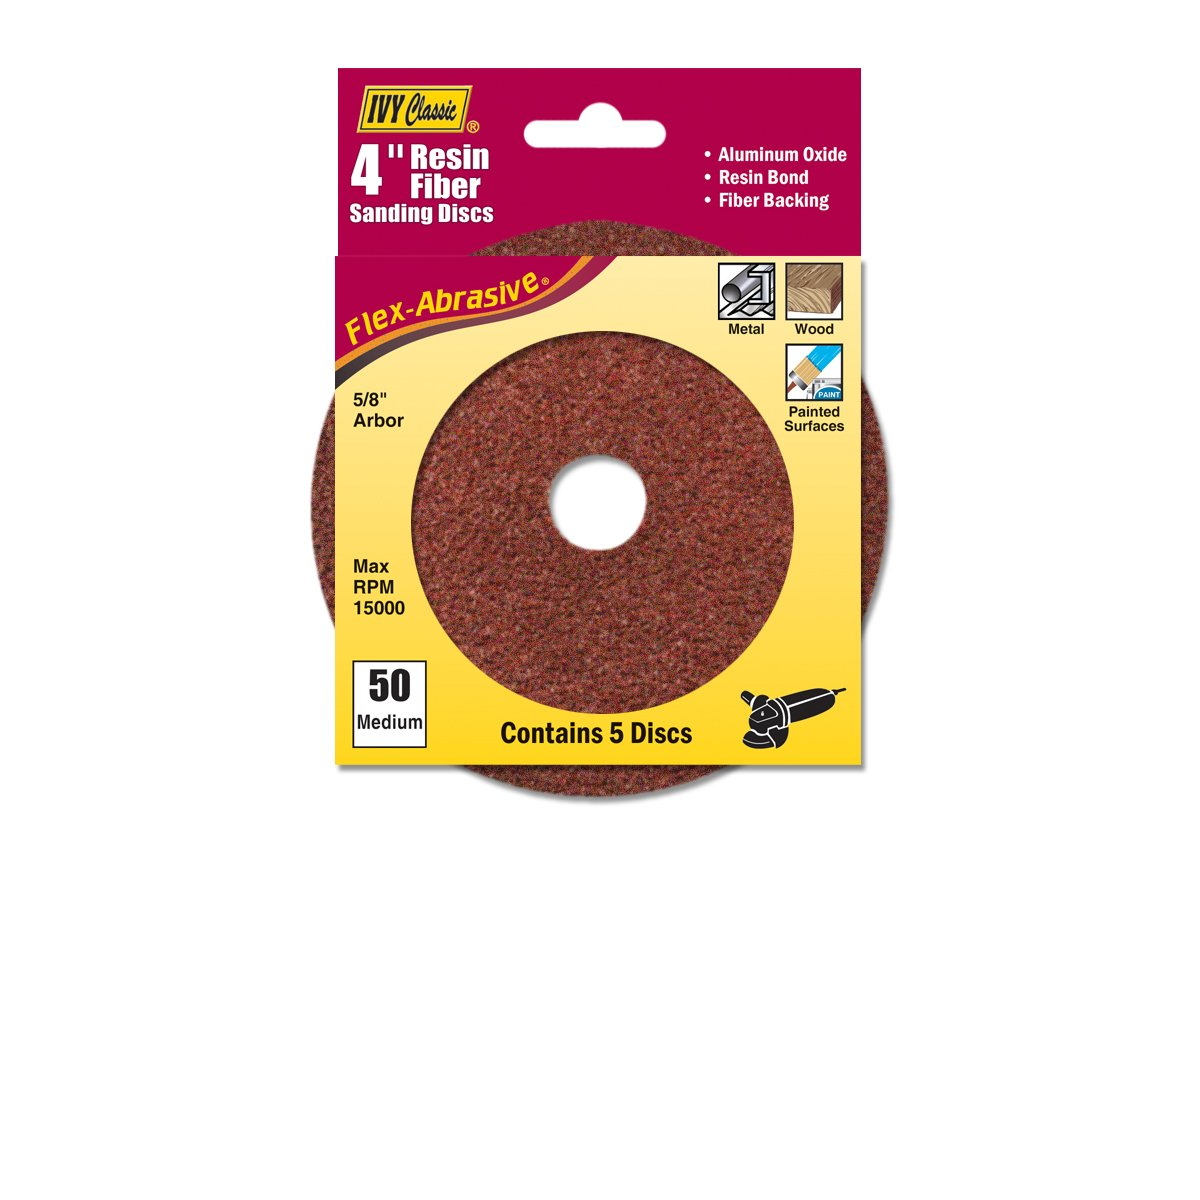 5//Card IVY Classic 42301 Flex-Abrasive 4-Inch x 5//8-Inch 36 Grit Coarse Resin Fiber Disc